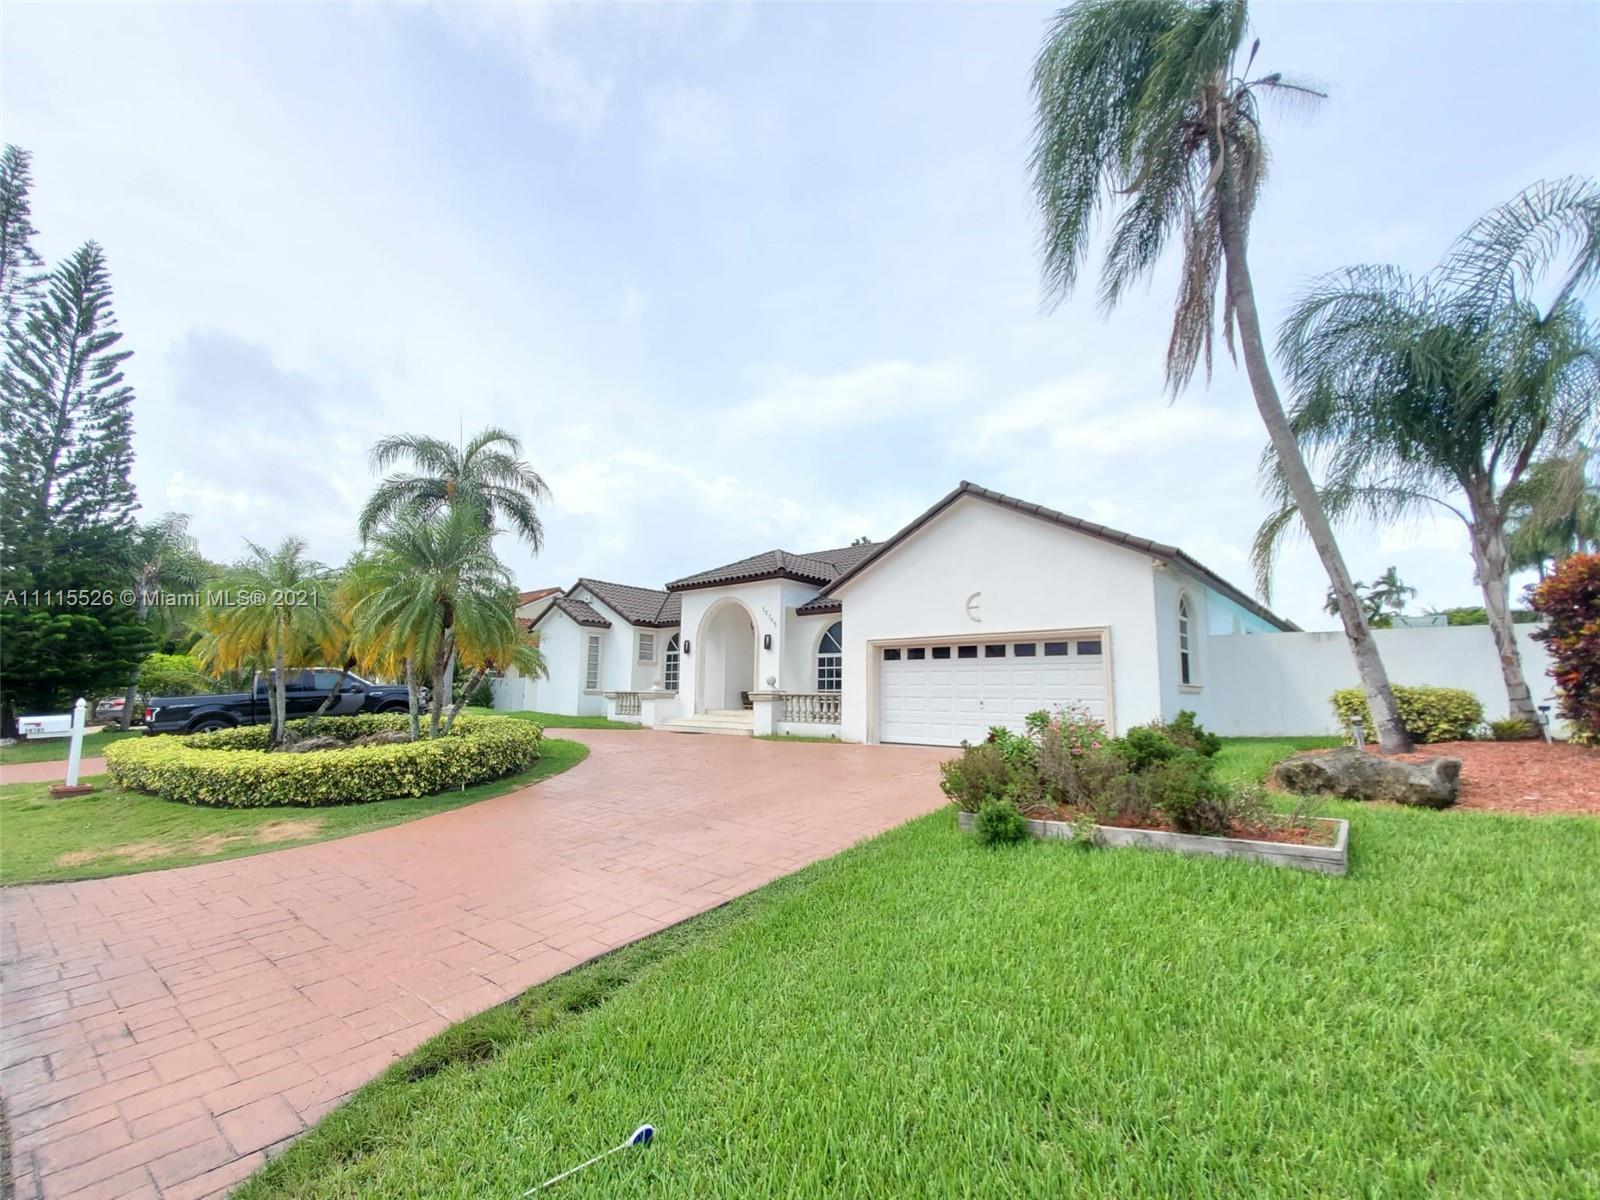 Single Family Home,For Sale,10705 SW 138th St, Miami, Florida 33176,Brickell,realty,broker,condos near me